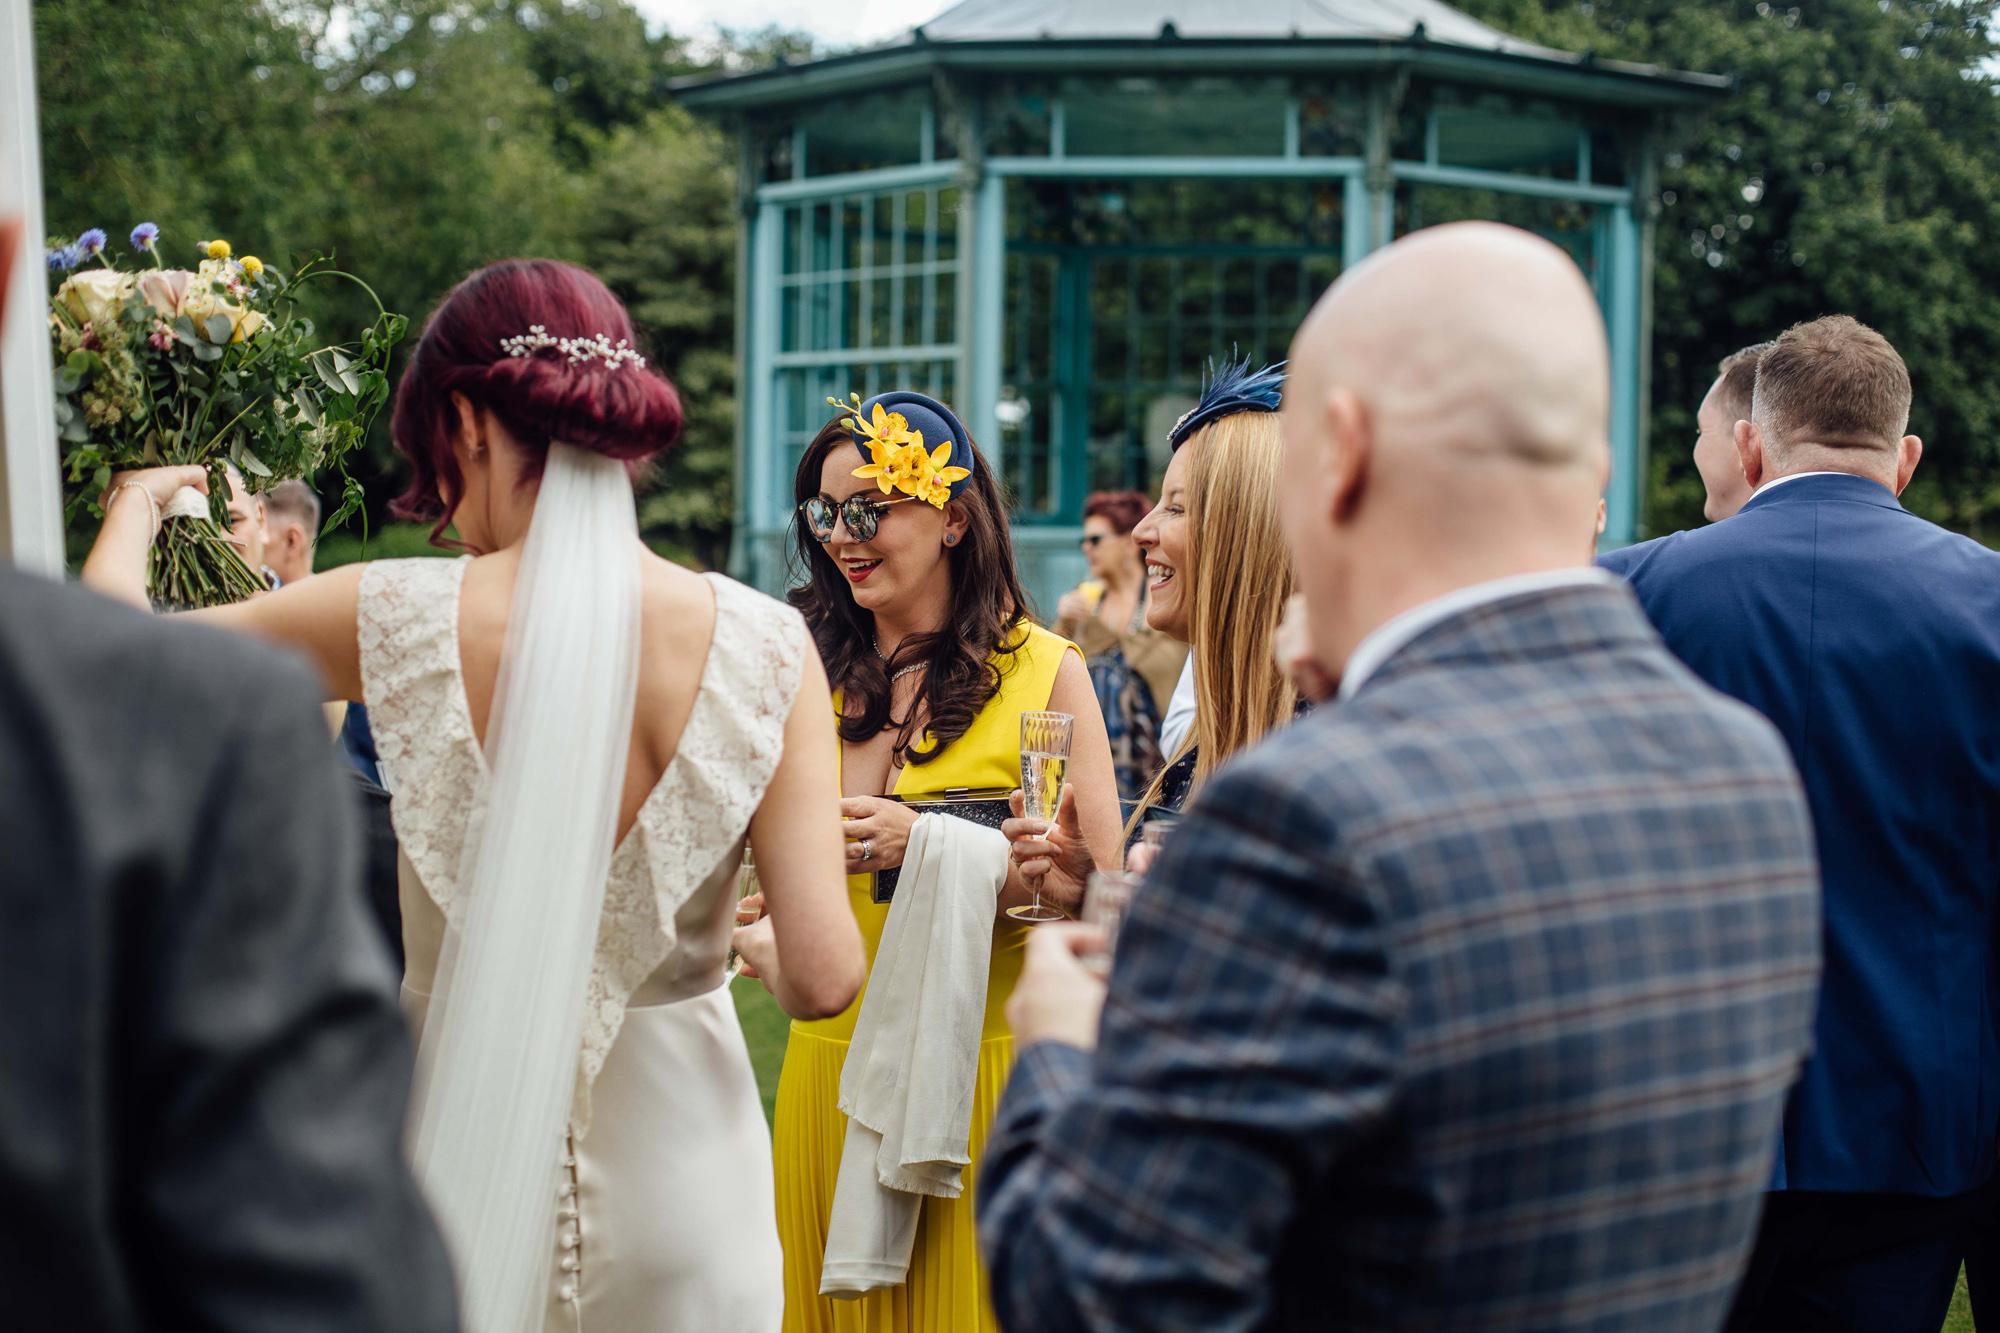 Sarah-Honeysuckle-Bias-Cut-Silk-Vintage-Inspired-Wedding-Gown-Sheffield-Wedding-Kate-Beaumont-24.jpg